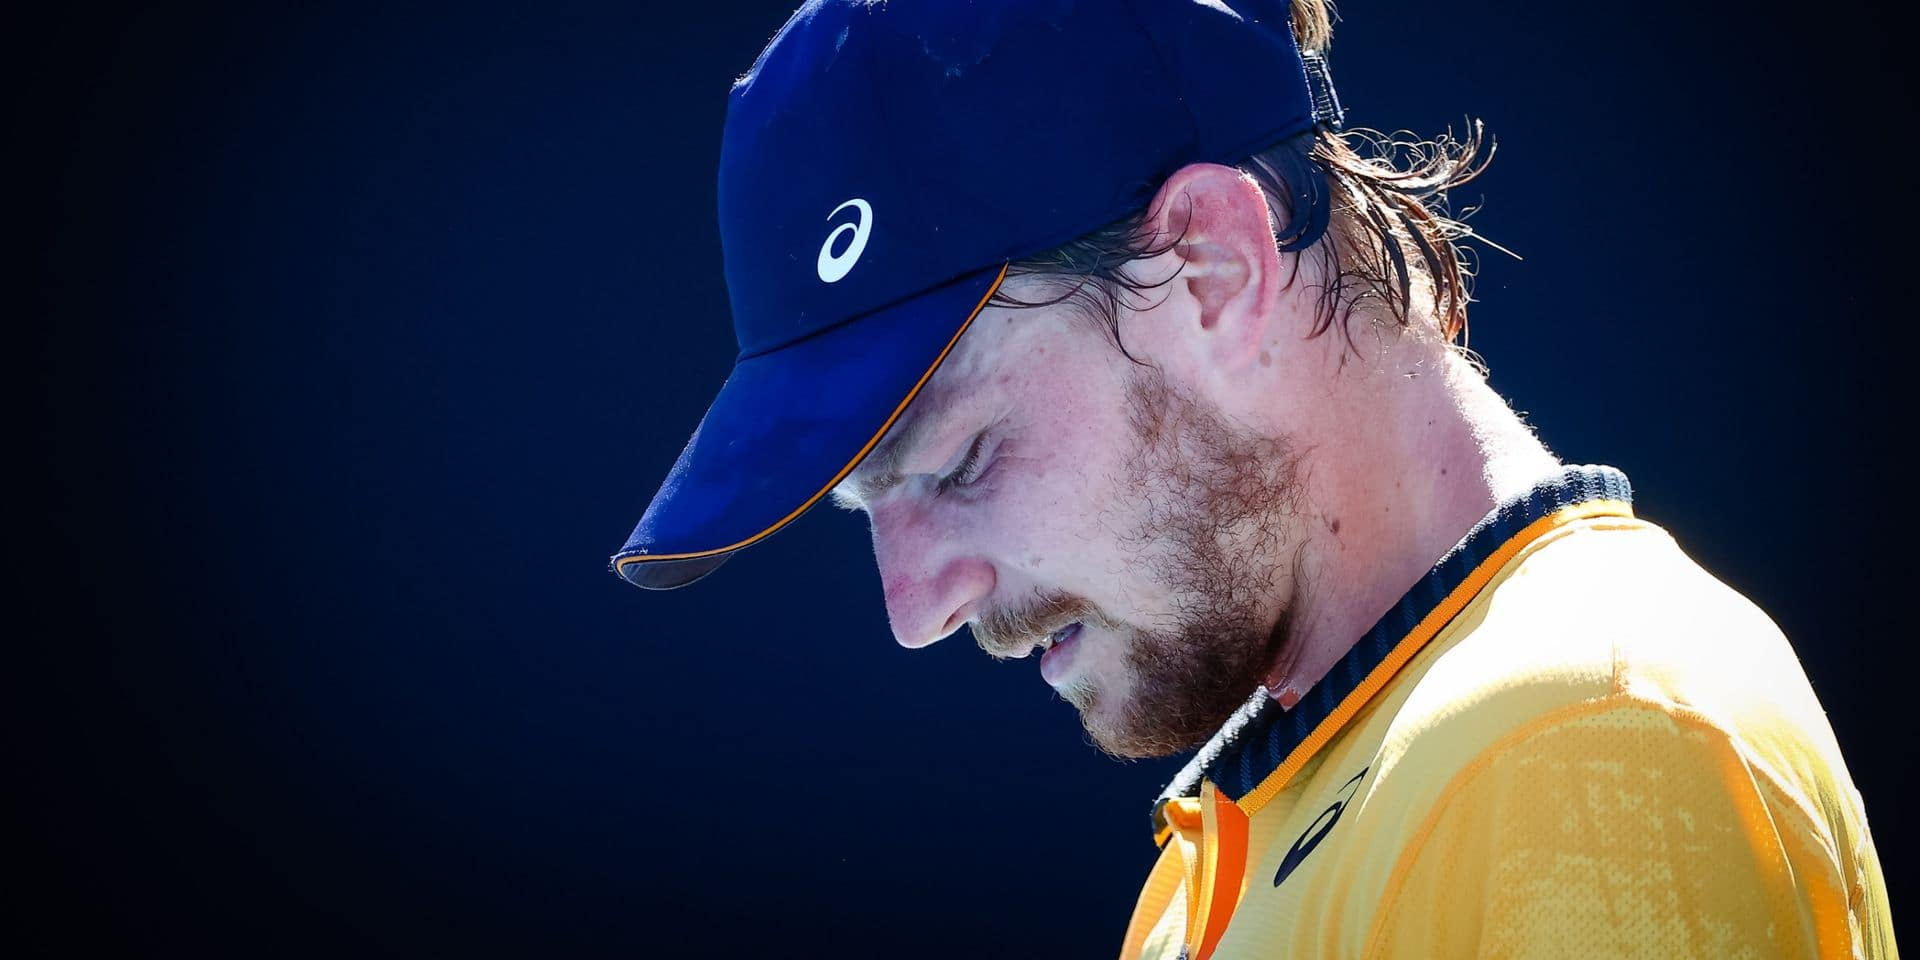 ATP Dubaï: David Goffin battu d'entrée par Nishikori